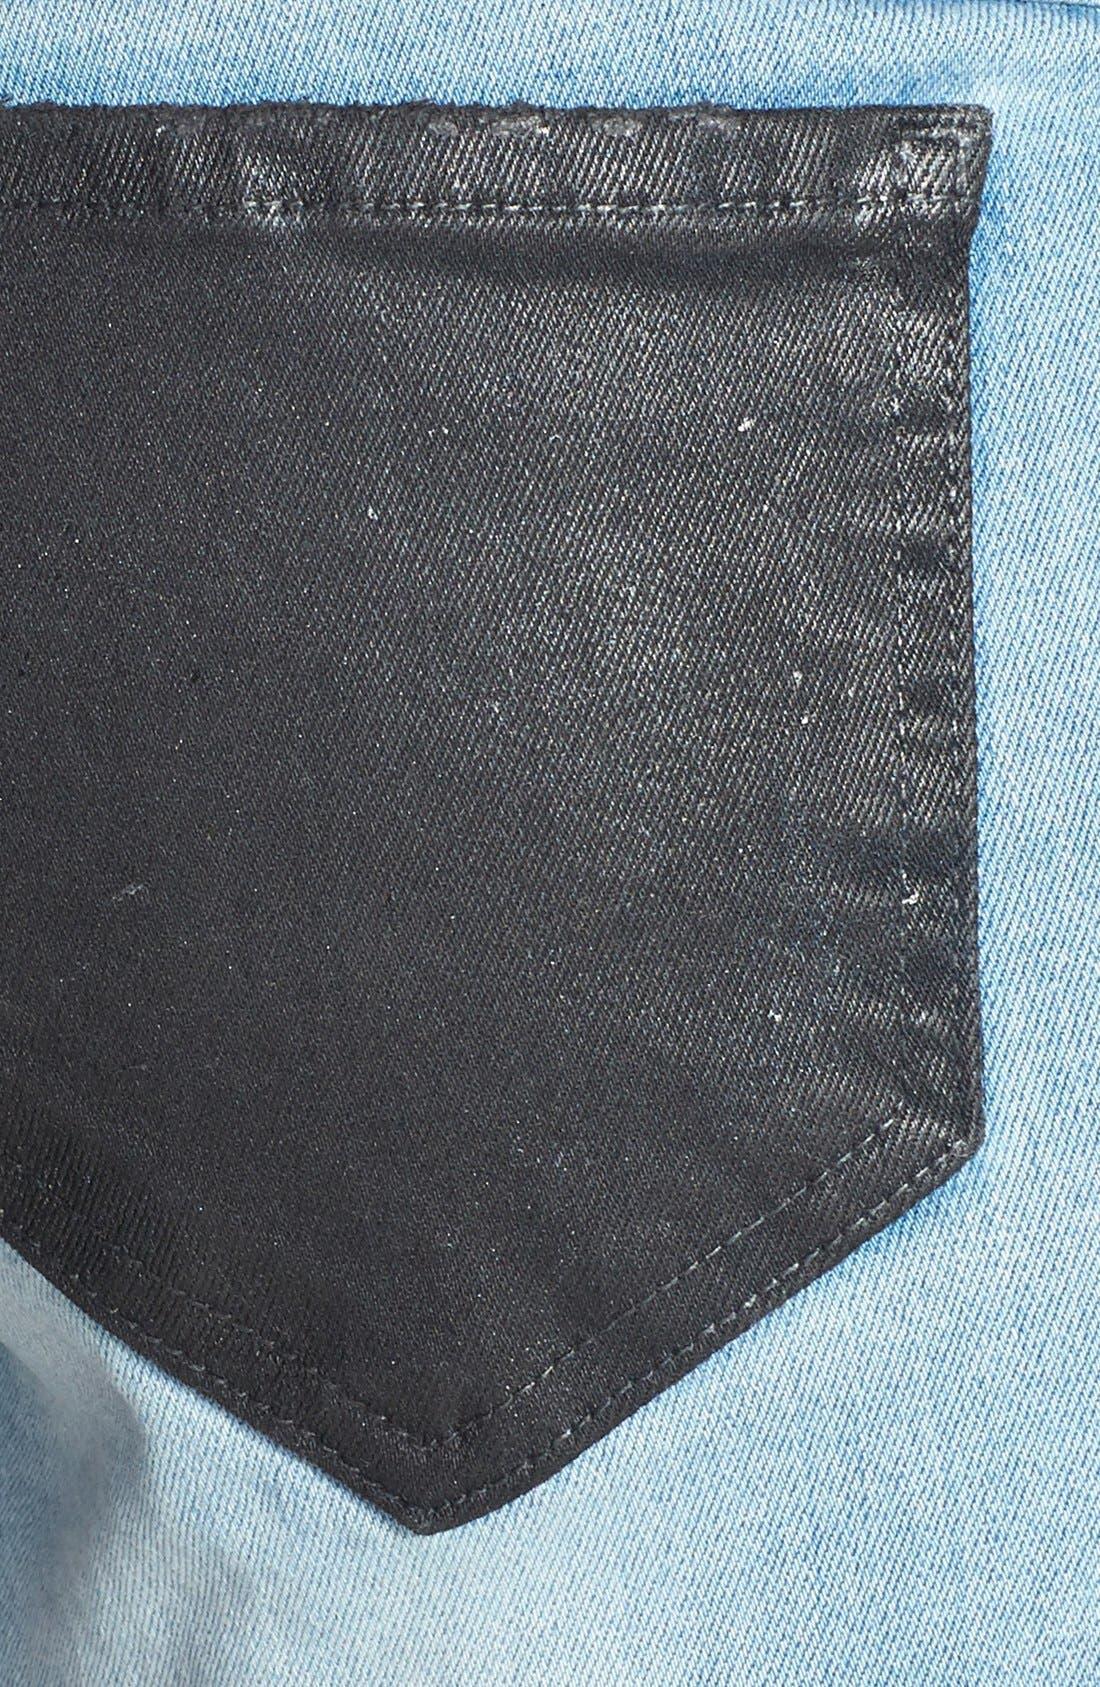 Alternate Image 3  - Wildfox 'Ruby' Contrast Pocket Cutoff Shorts (Soulmates)